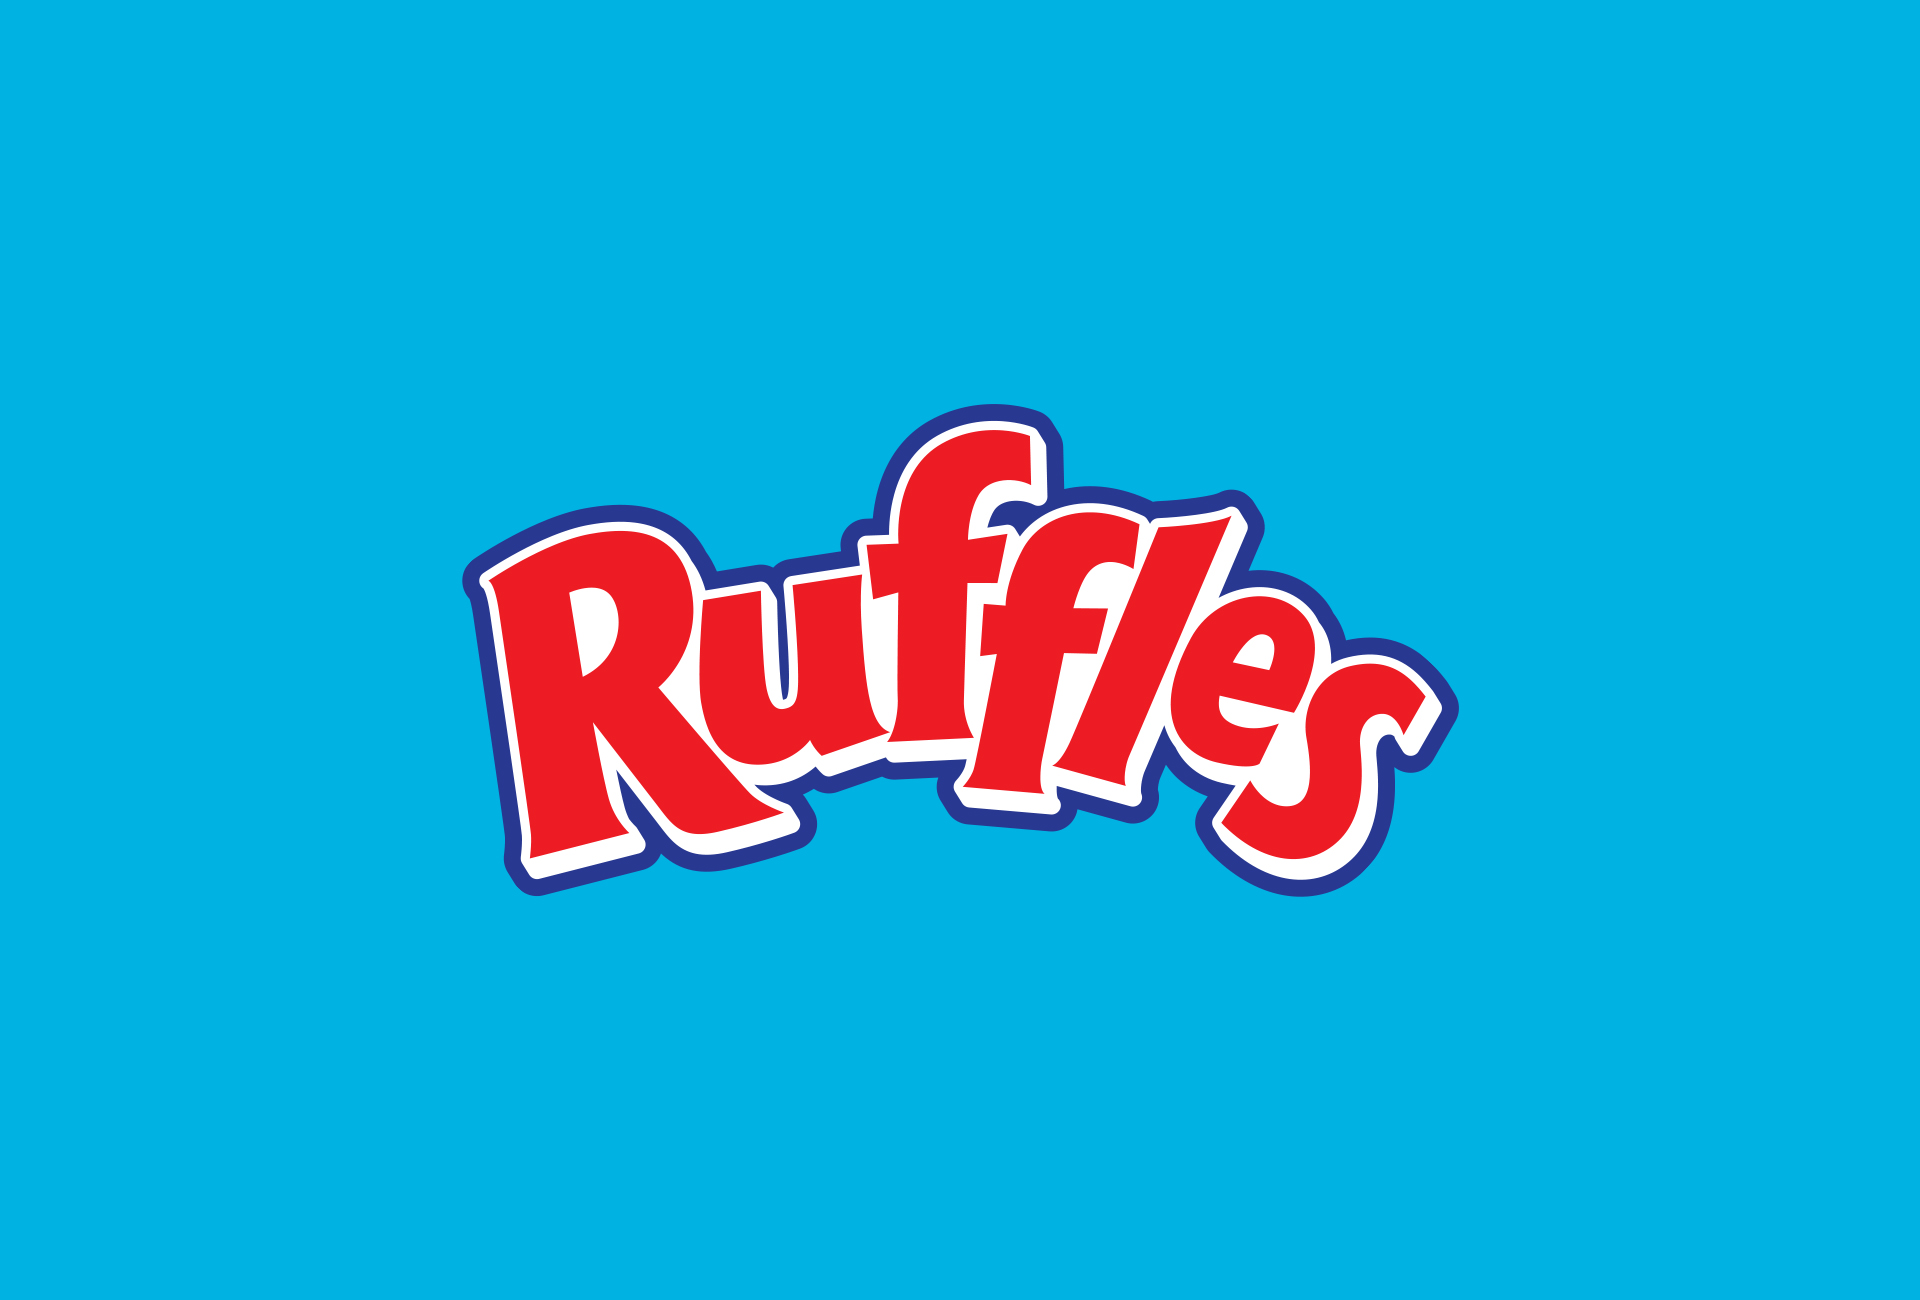 ruffles redesign - johann vernizzi